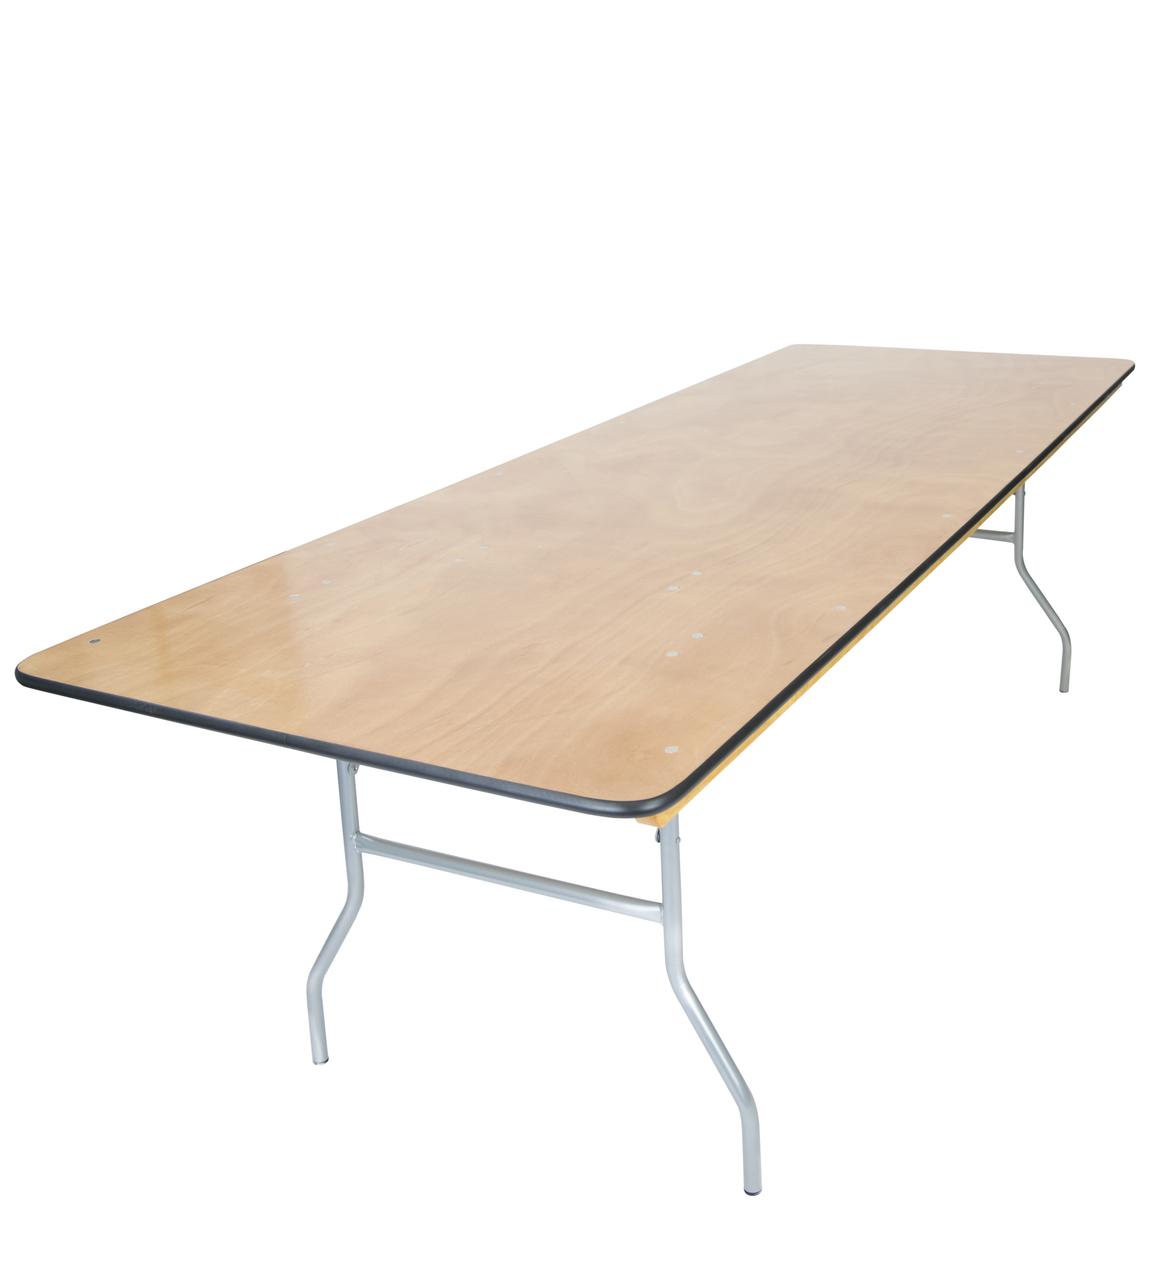 Remarkable Luan 40X96 8 Ft Queen Rectangle Wood Folding Table Vinyl Edging Bolt Thru Top Locking Steel Frame Frankydiablos Diy Chair Ideas Frankydiabloscom